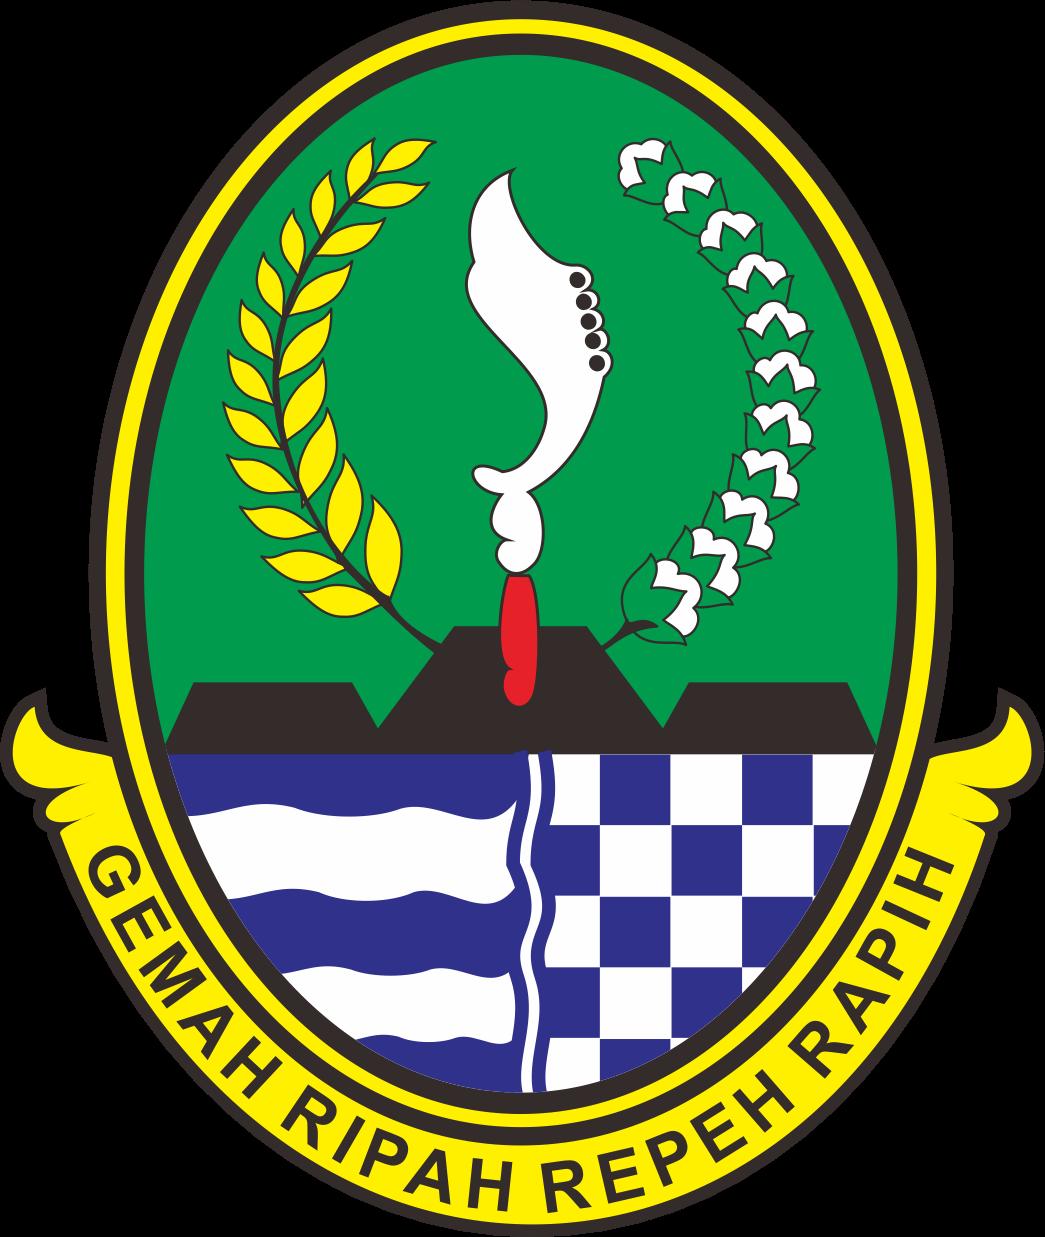 Website Provinsi Jawa Barat